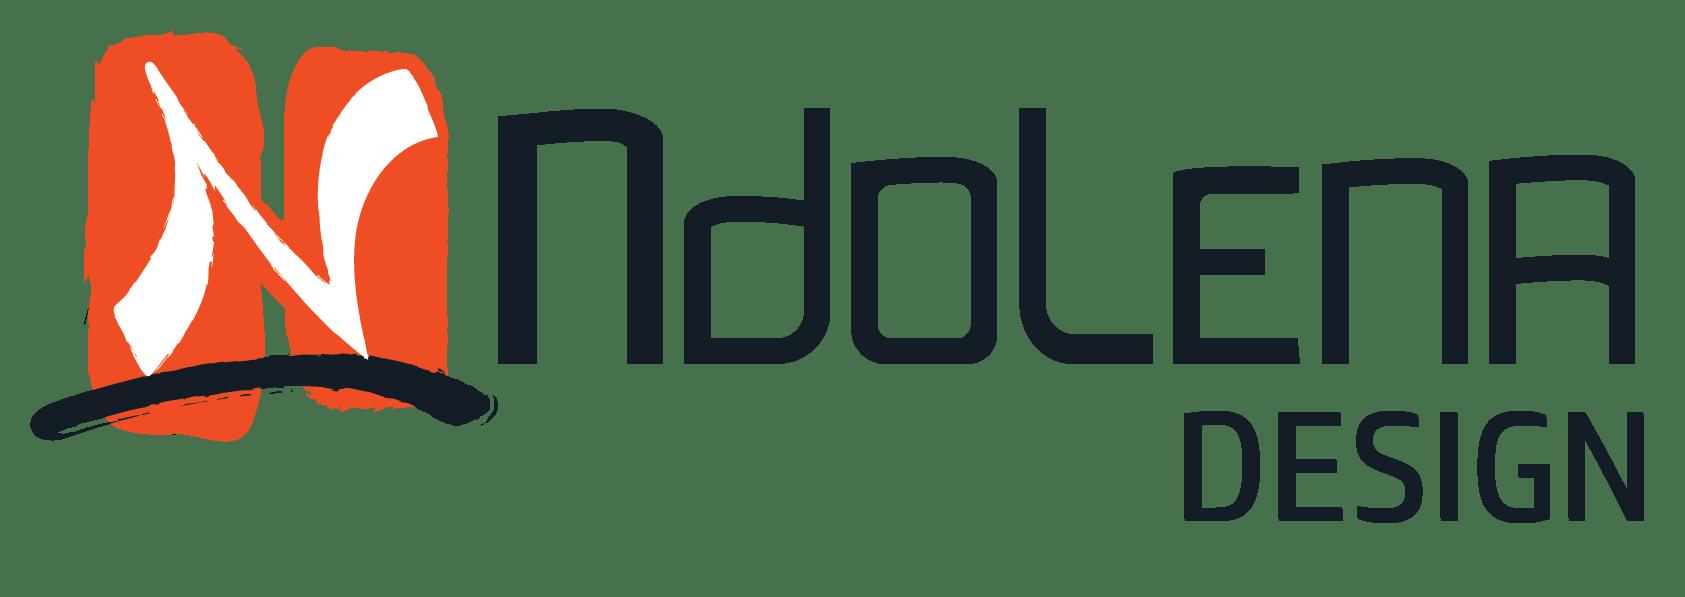 Ndolena Design RDC - logo dark _ sq_Graphic Design